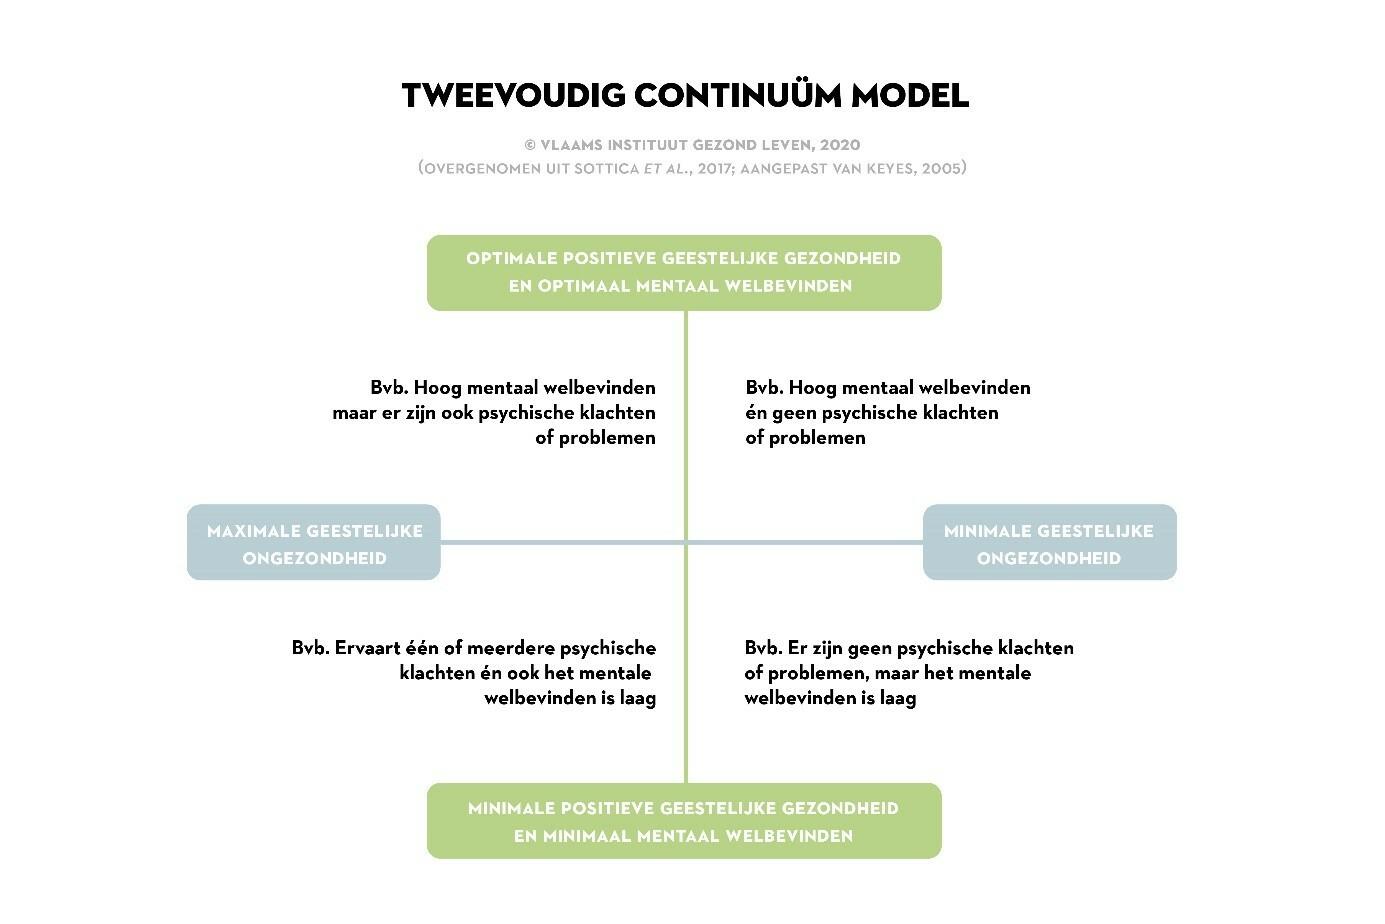 Tweevoudige continuum model